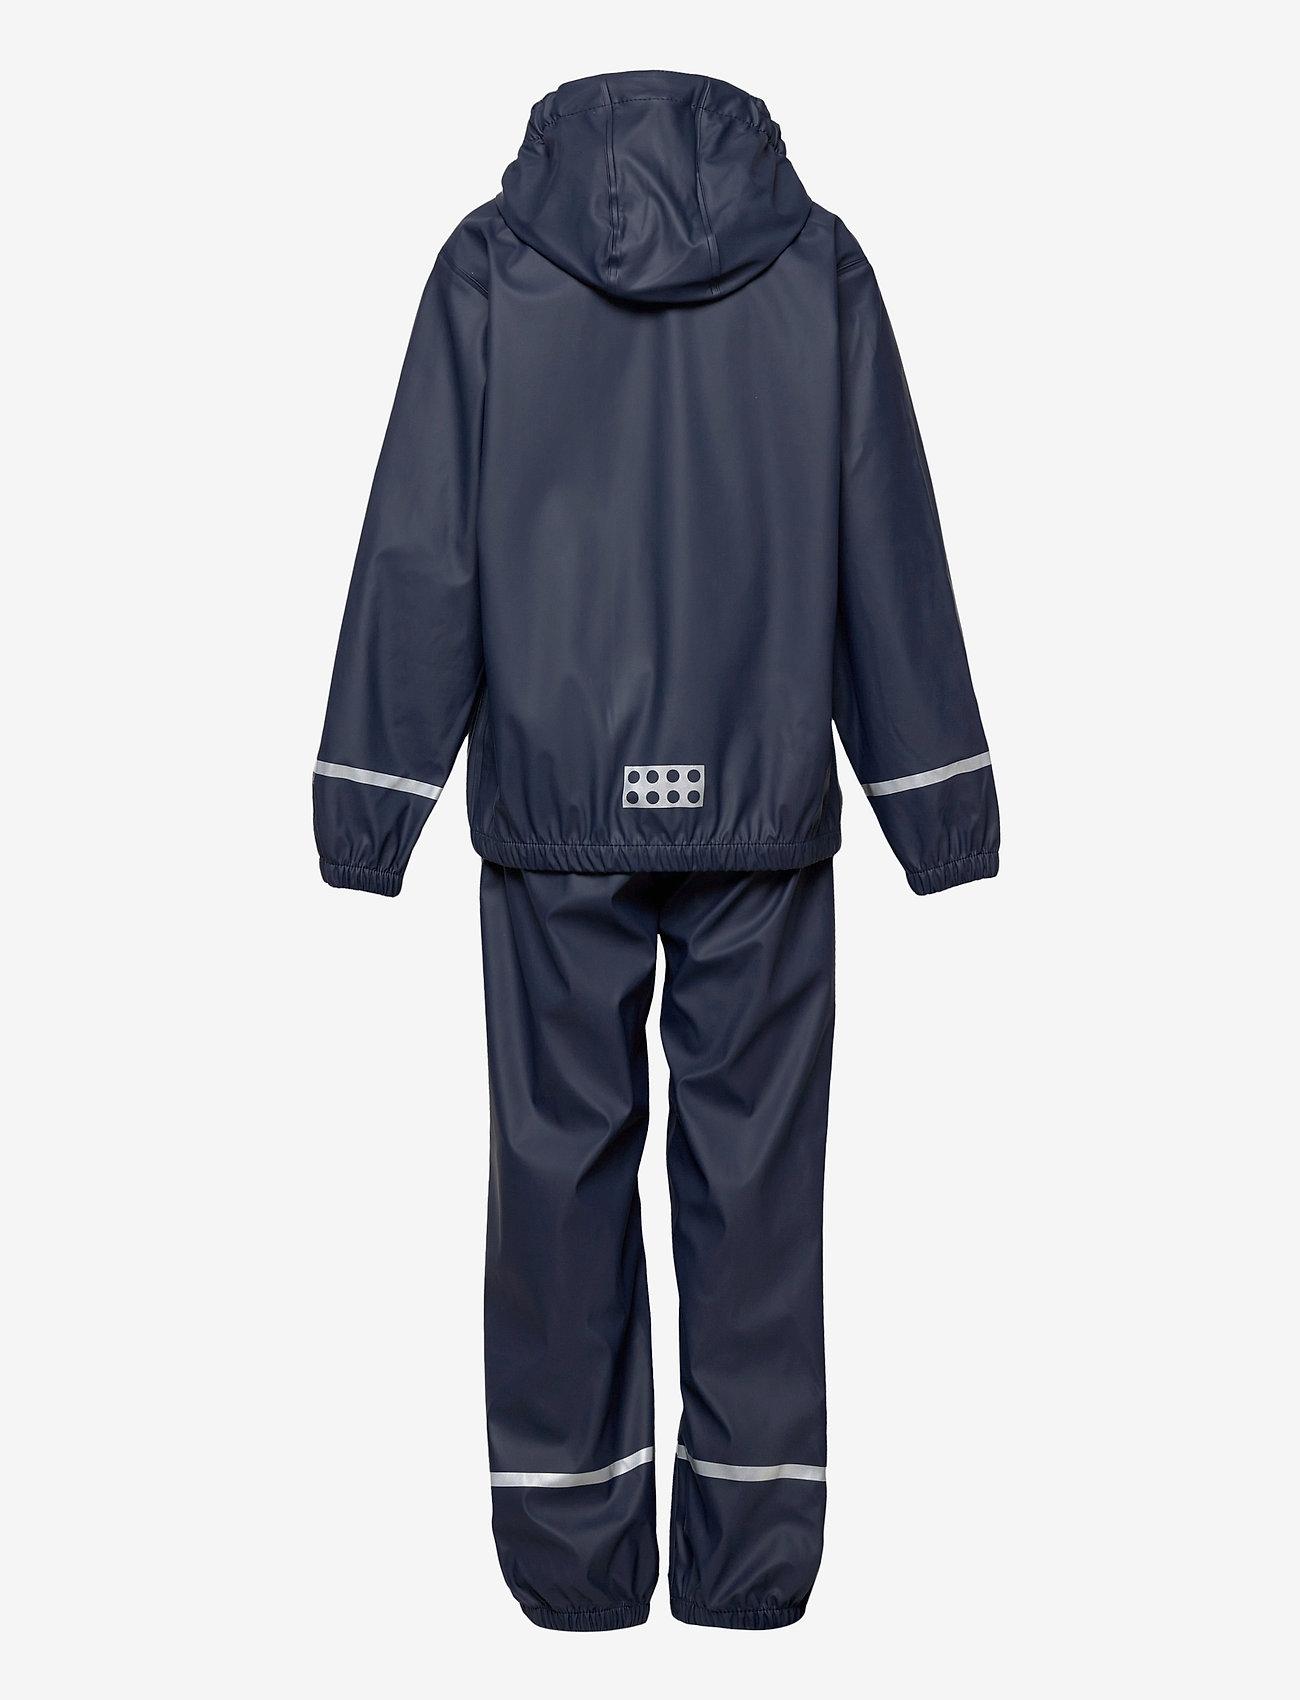 Lego wear - LWJORI 200 - PU RAIN SET - ensembles - dark navy - 1